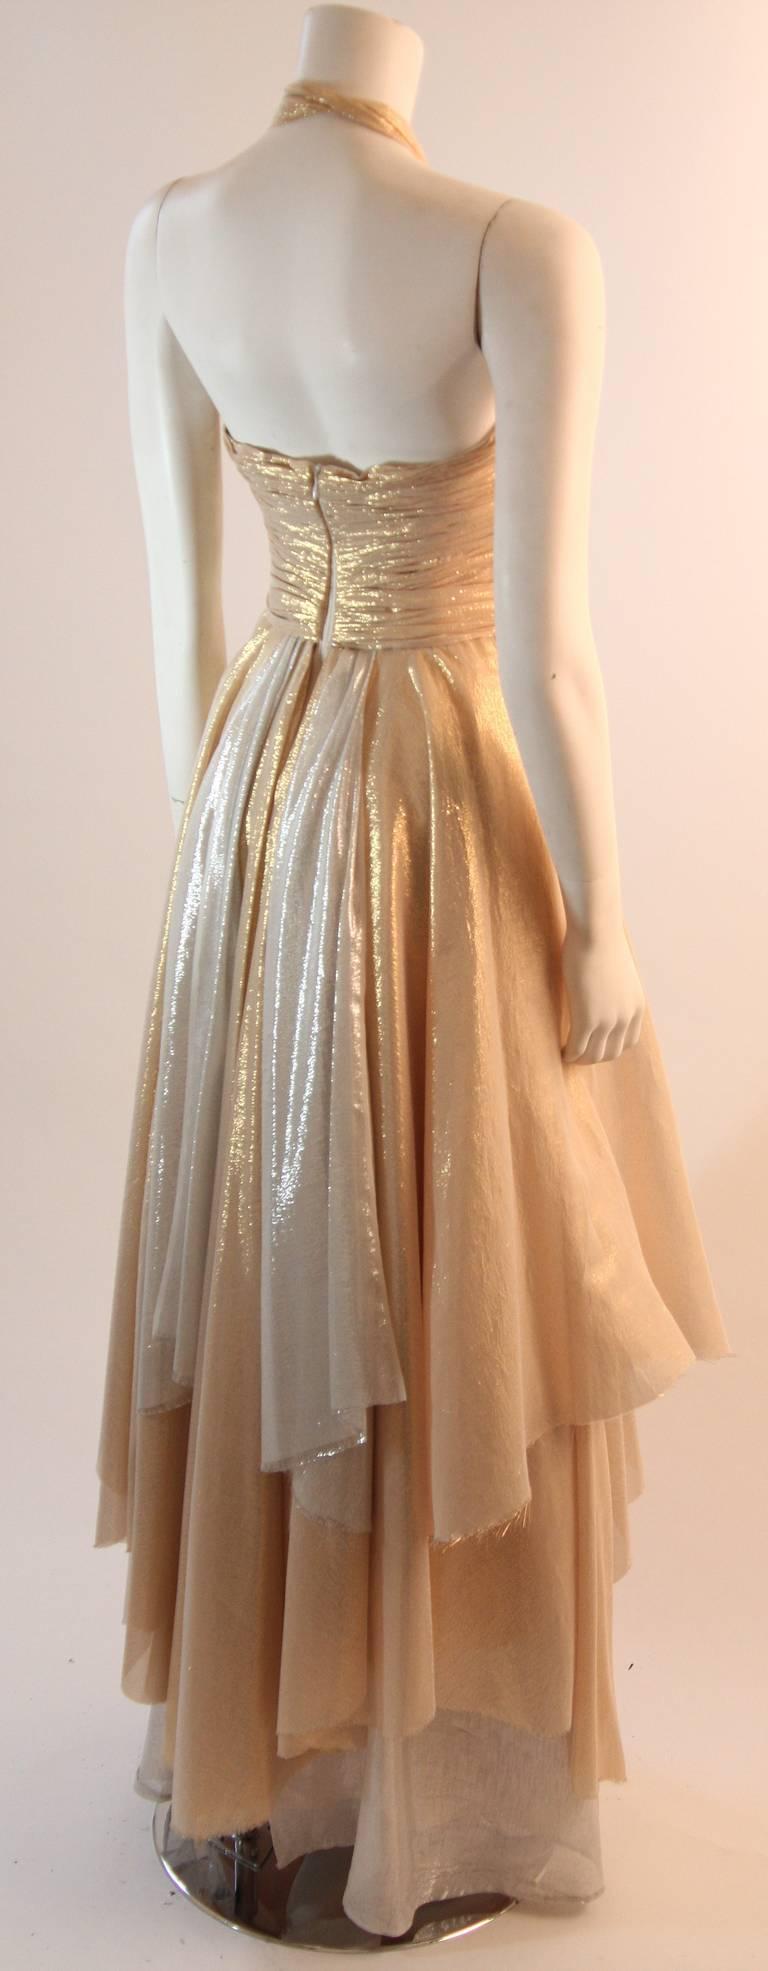 Elizabeth Mason Gold Lame Custom Couture Gown 5